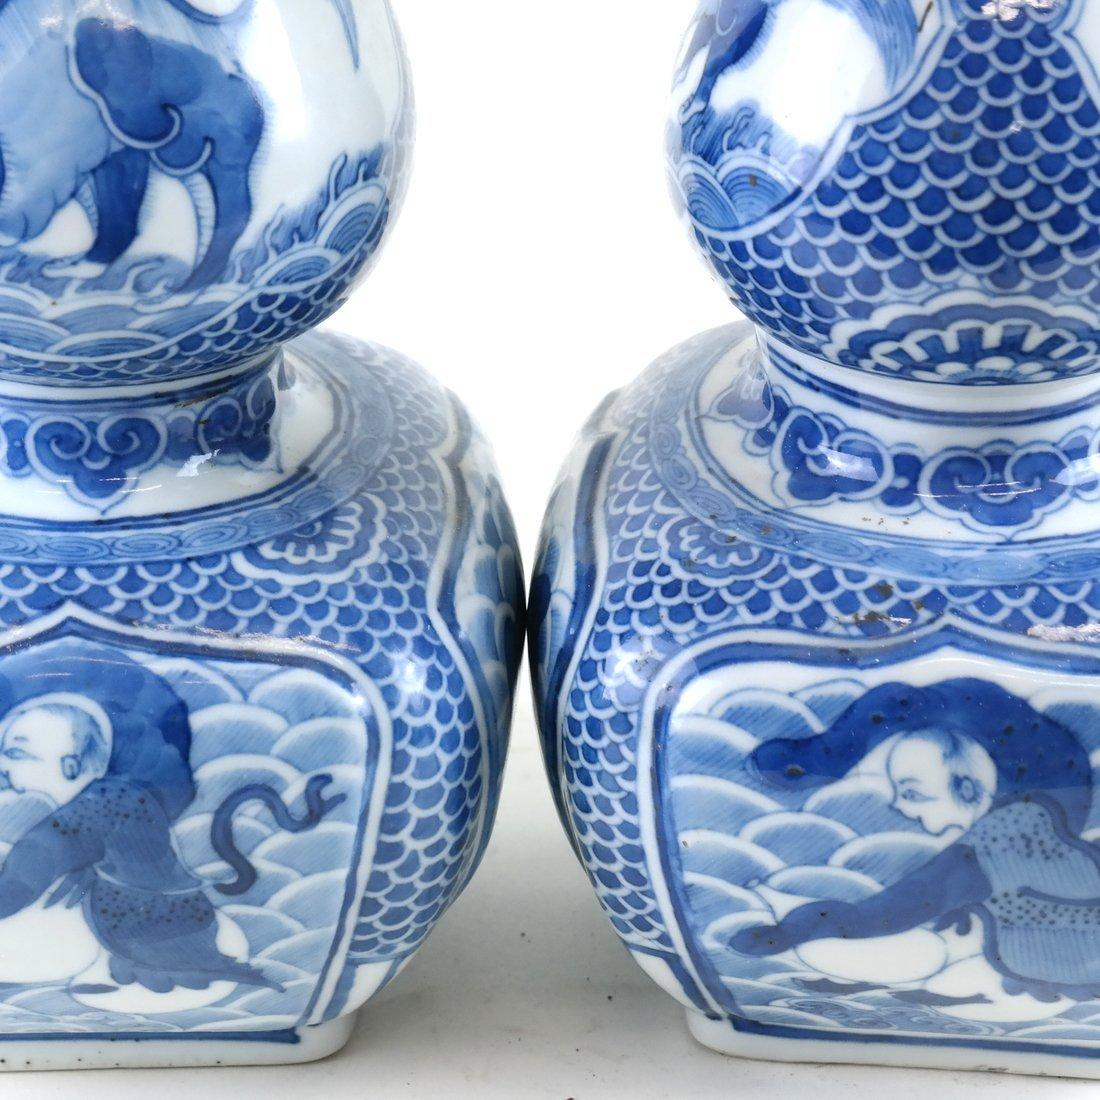 Pair of Asian-Style Blue & White Vases - 6